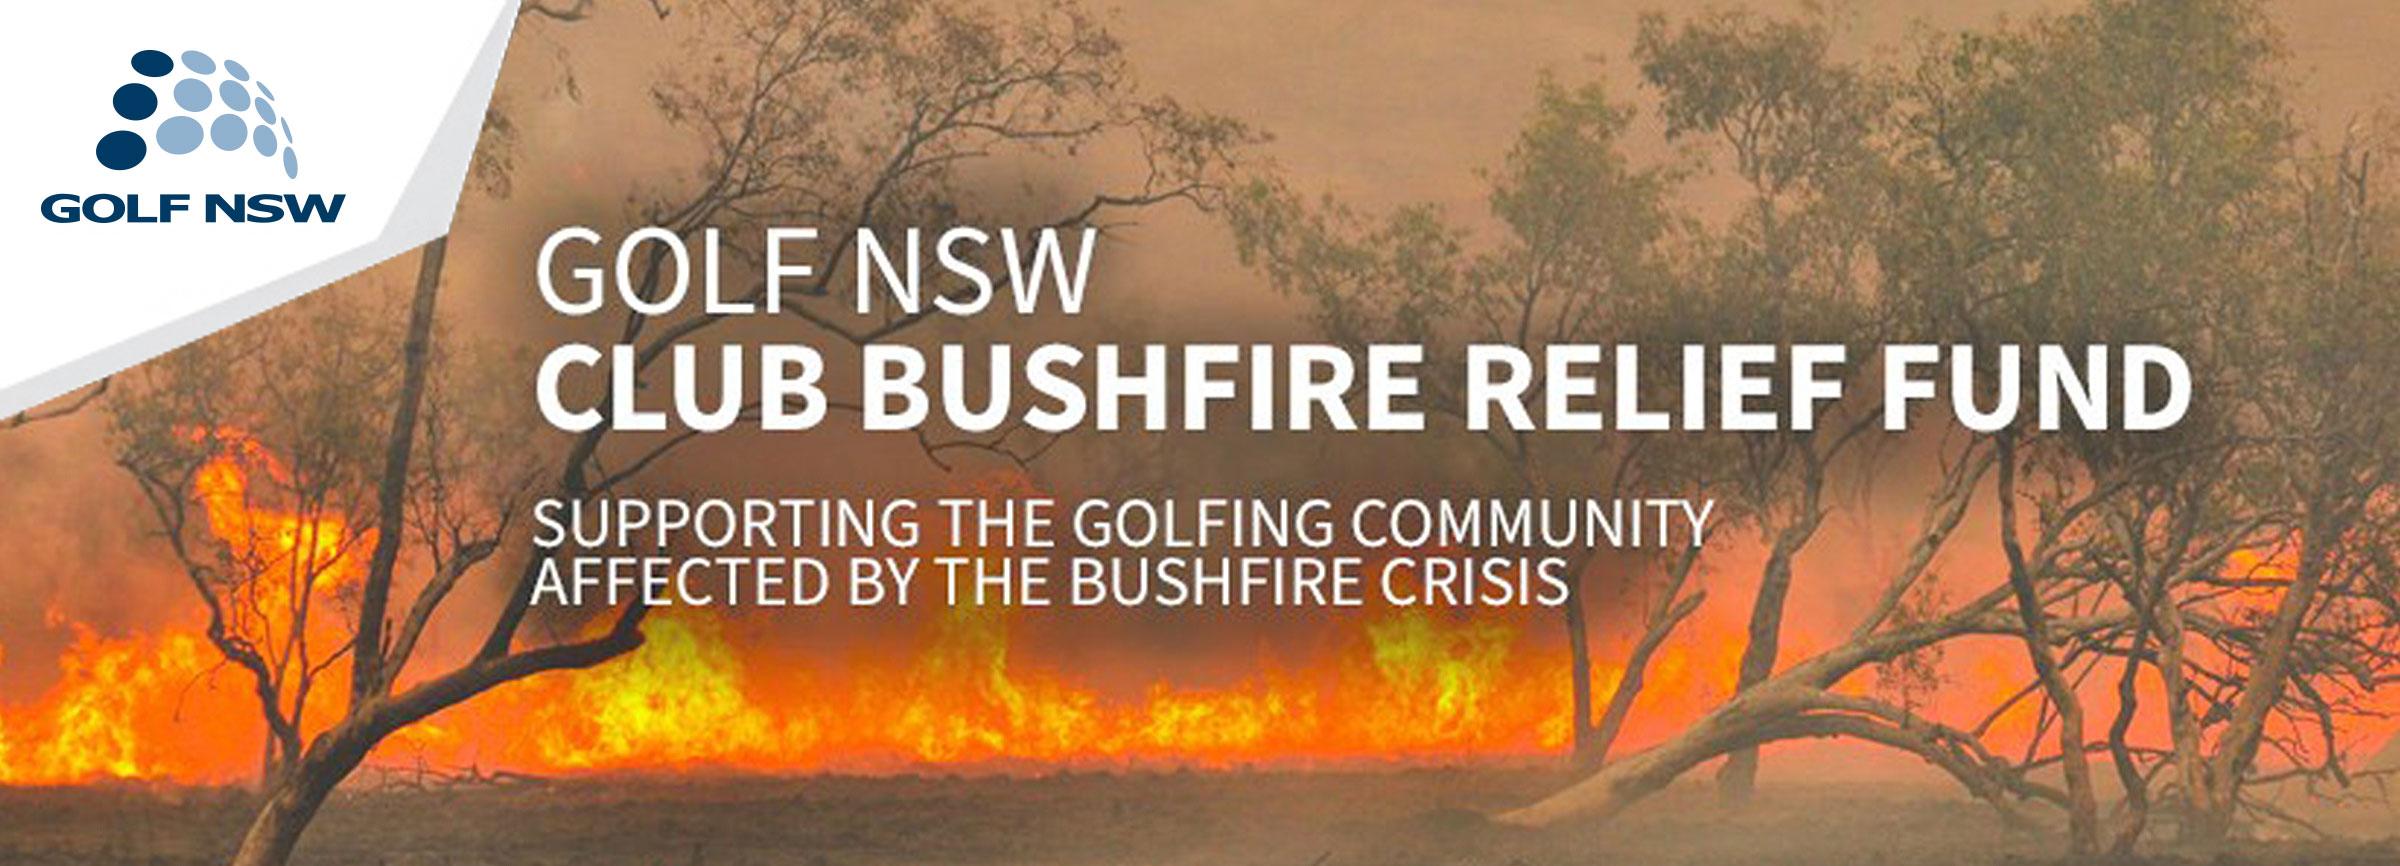 Announcing Club Bushfire Relief Fund